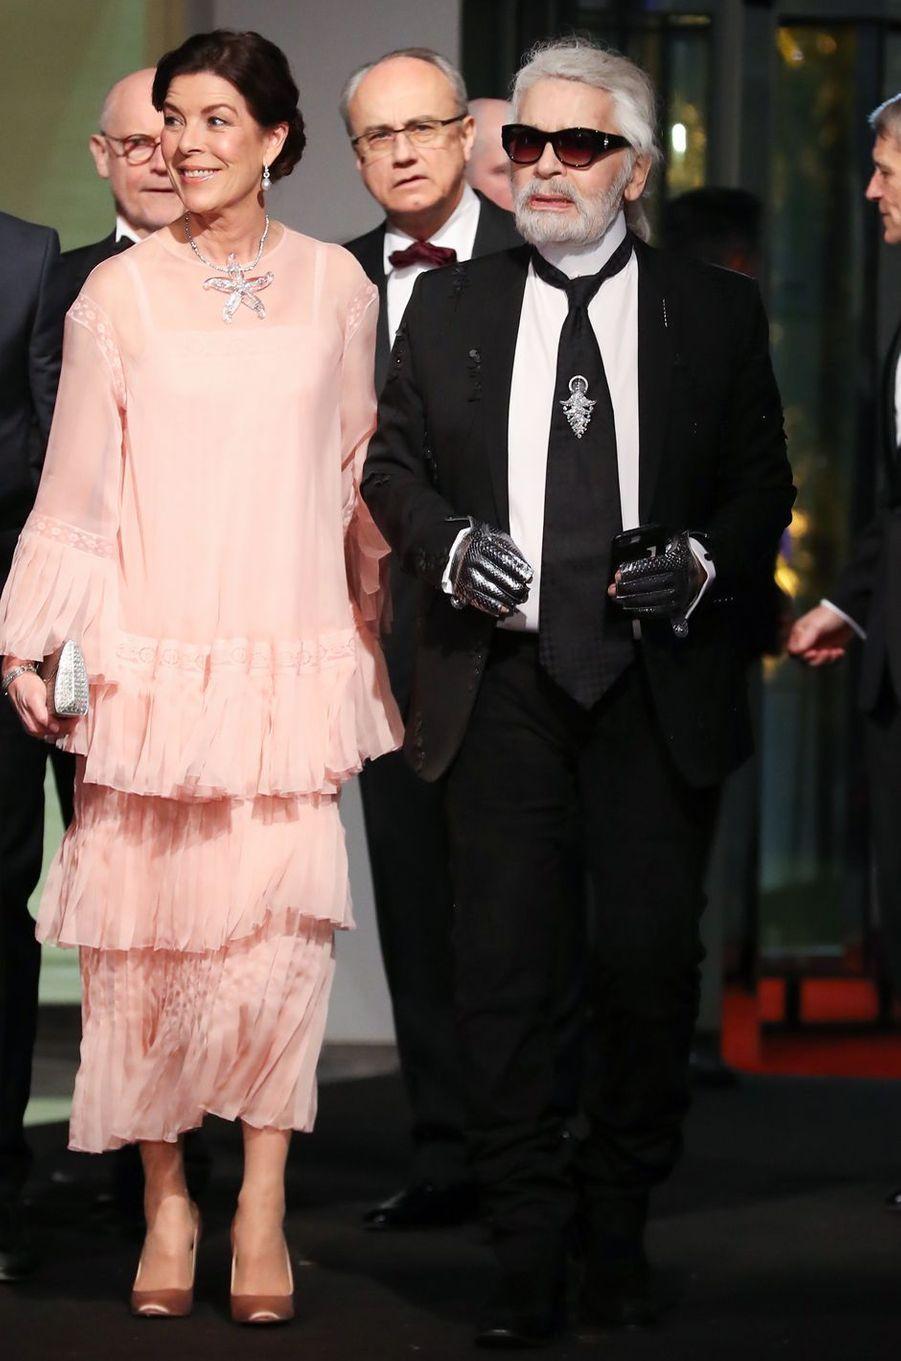 La princesse Caroline de Hanovre en Chanel à Monaco, le 24 mars 2018